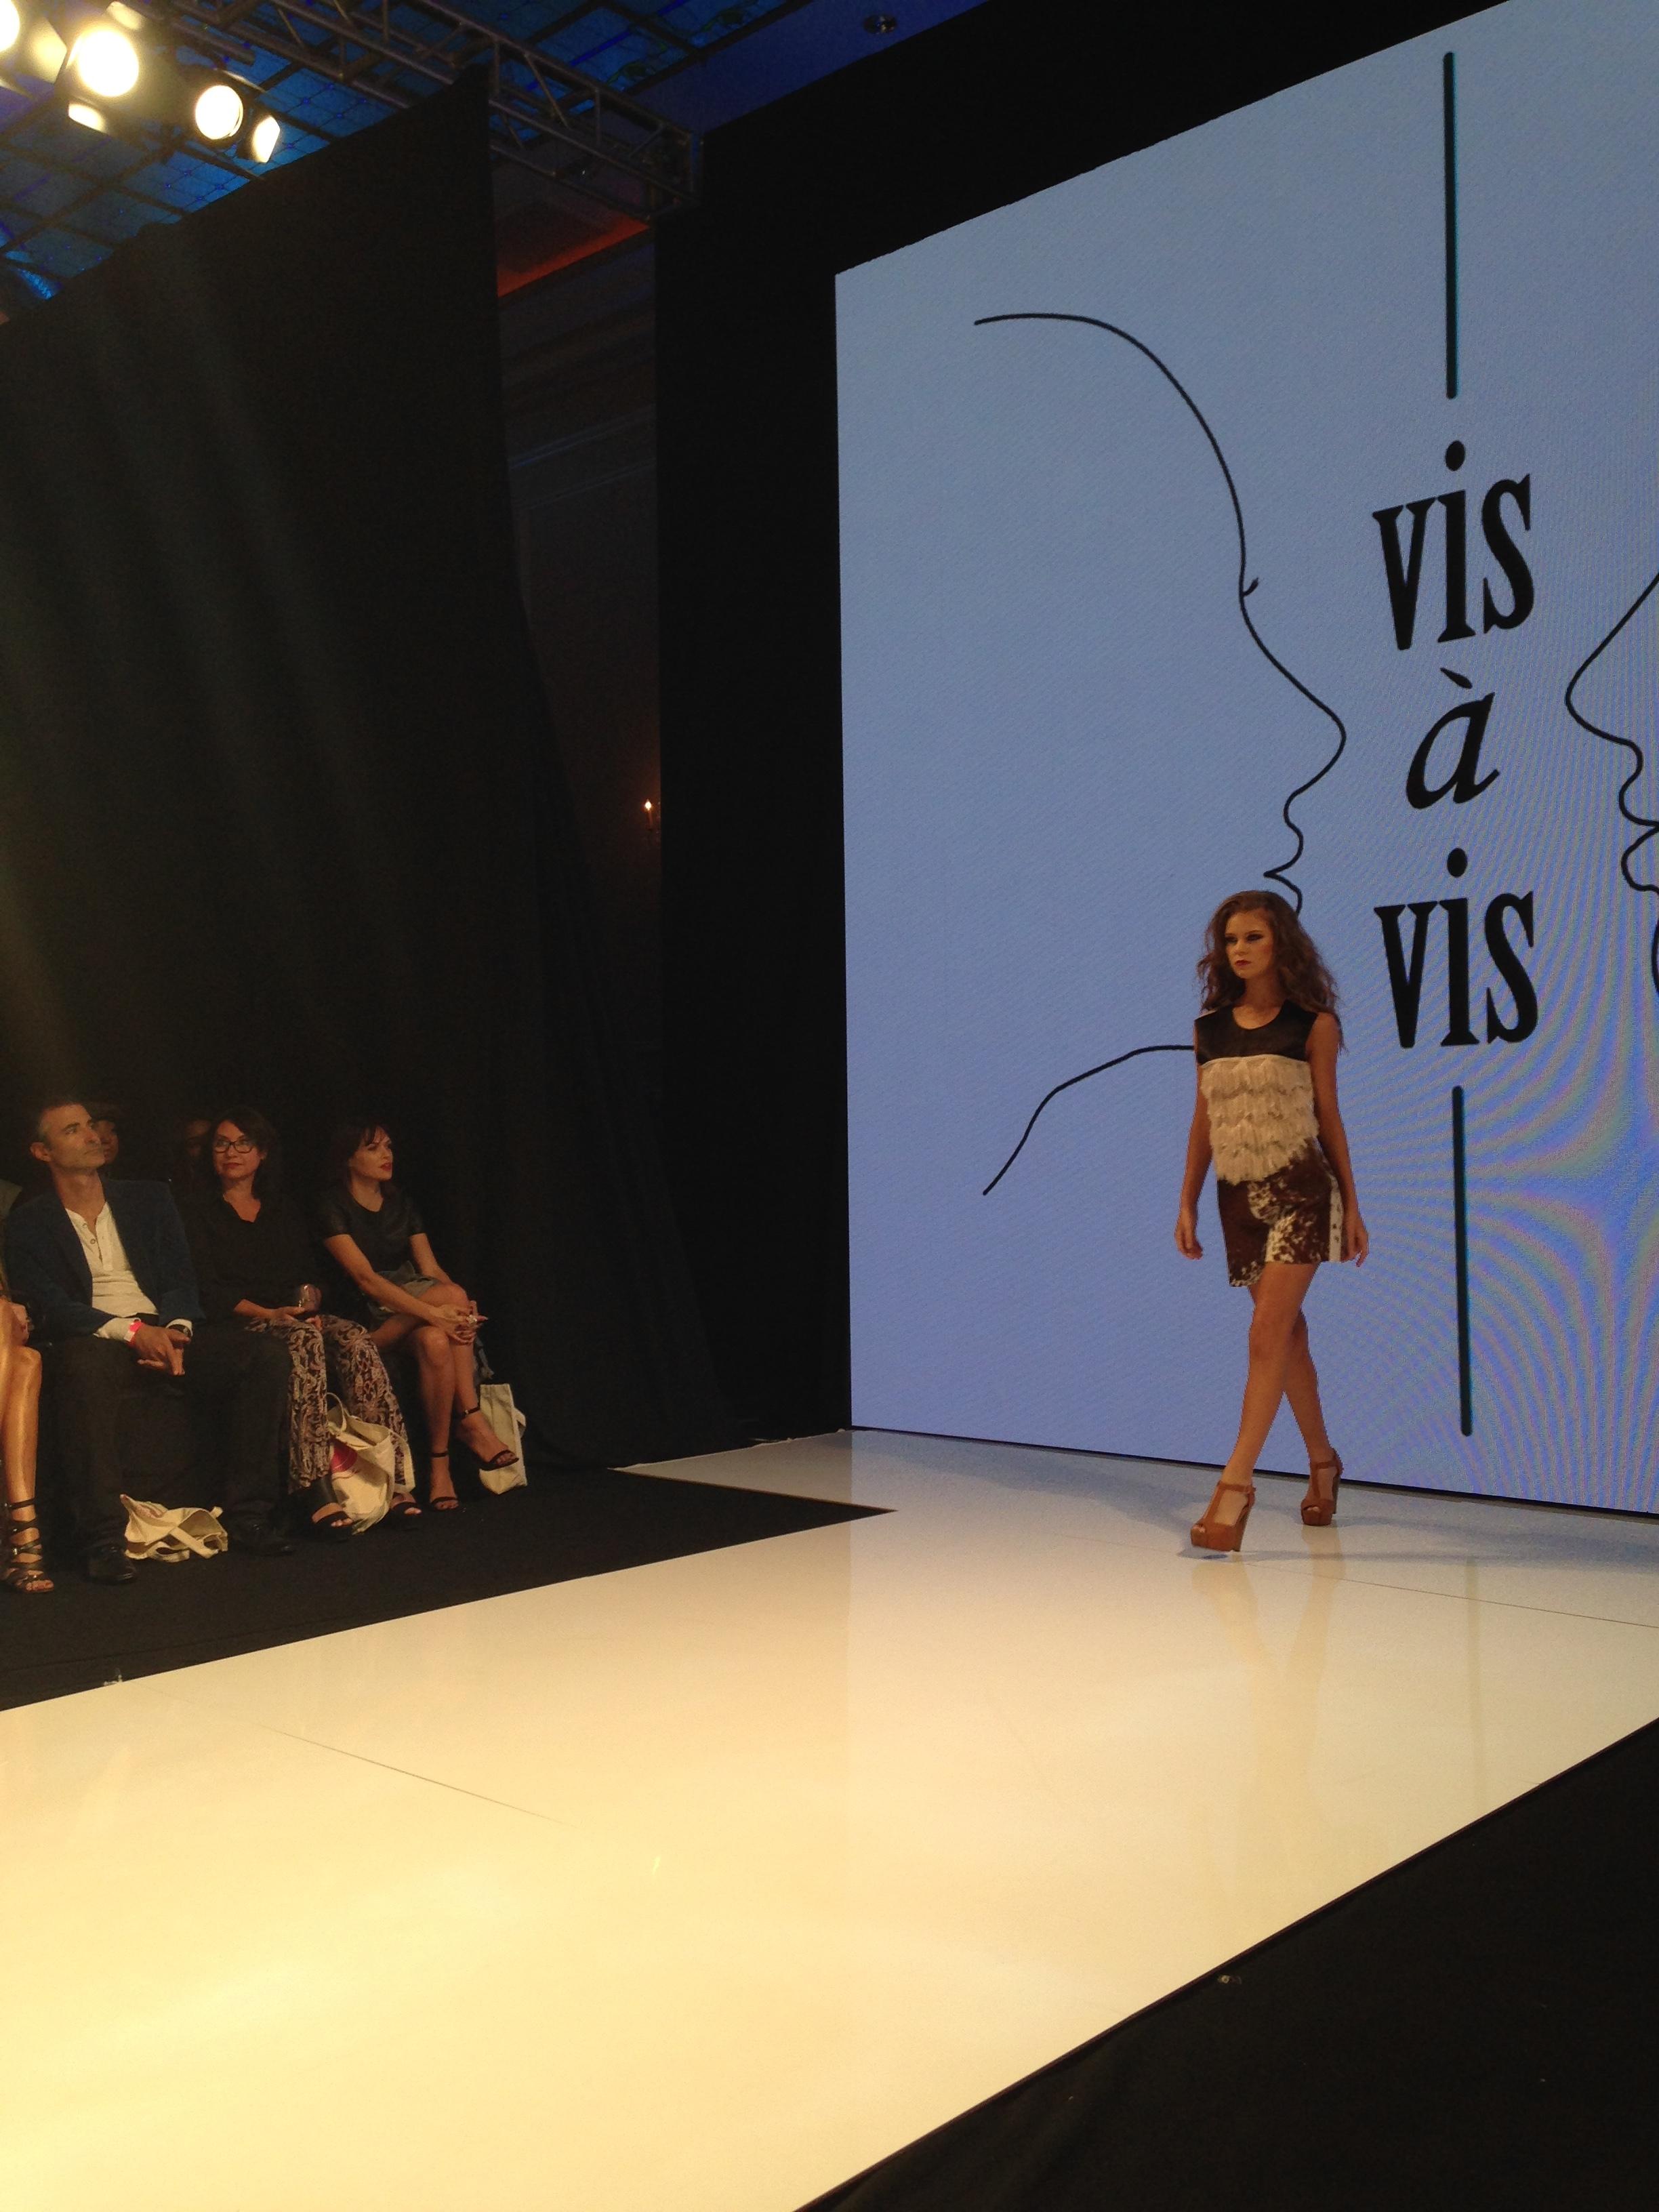 Csulb Alumni Debuts Clothing Line At La Fashion Week Art Hearts Fashion Show Dig Mag